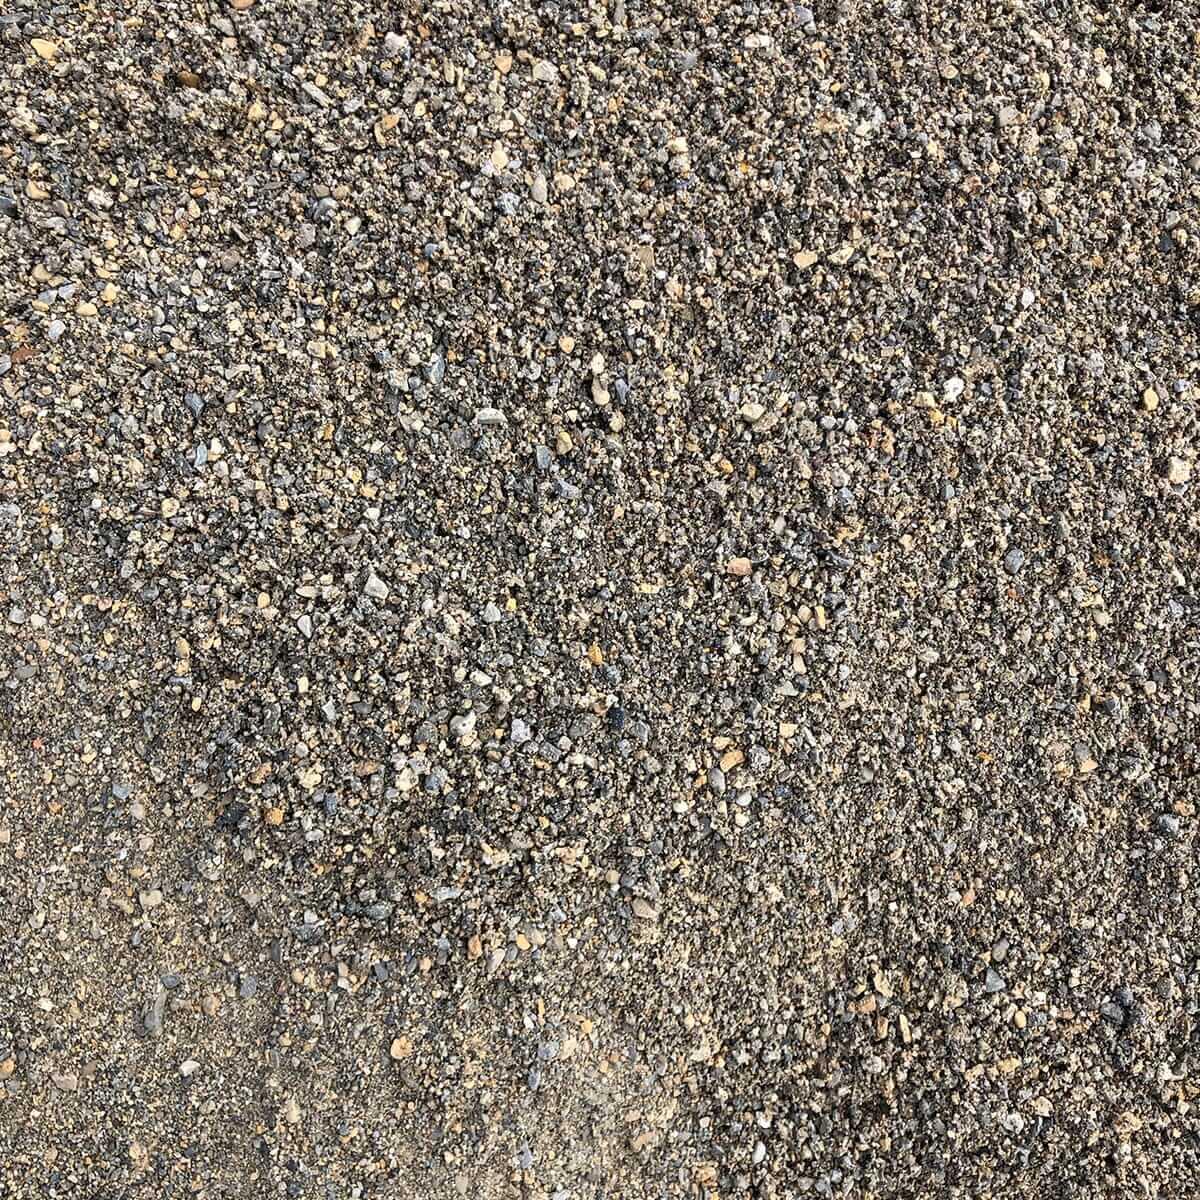 C33-Septic-Sand-min.jpg